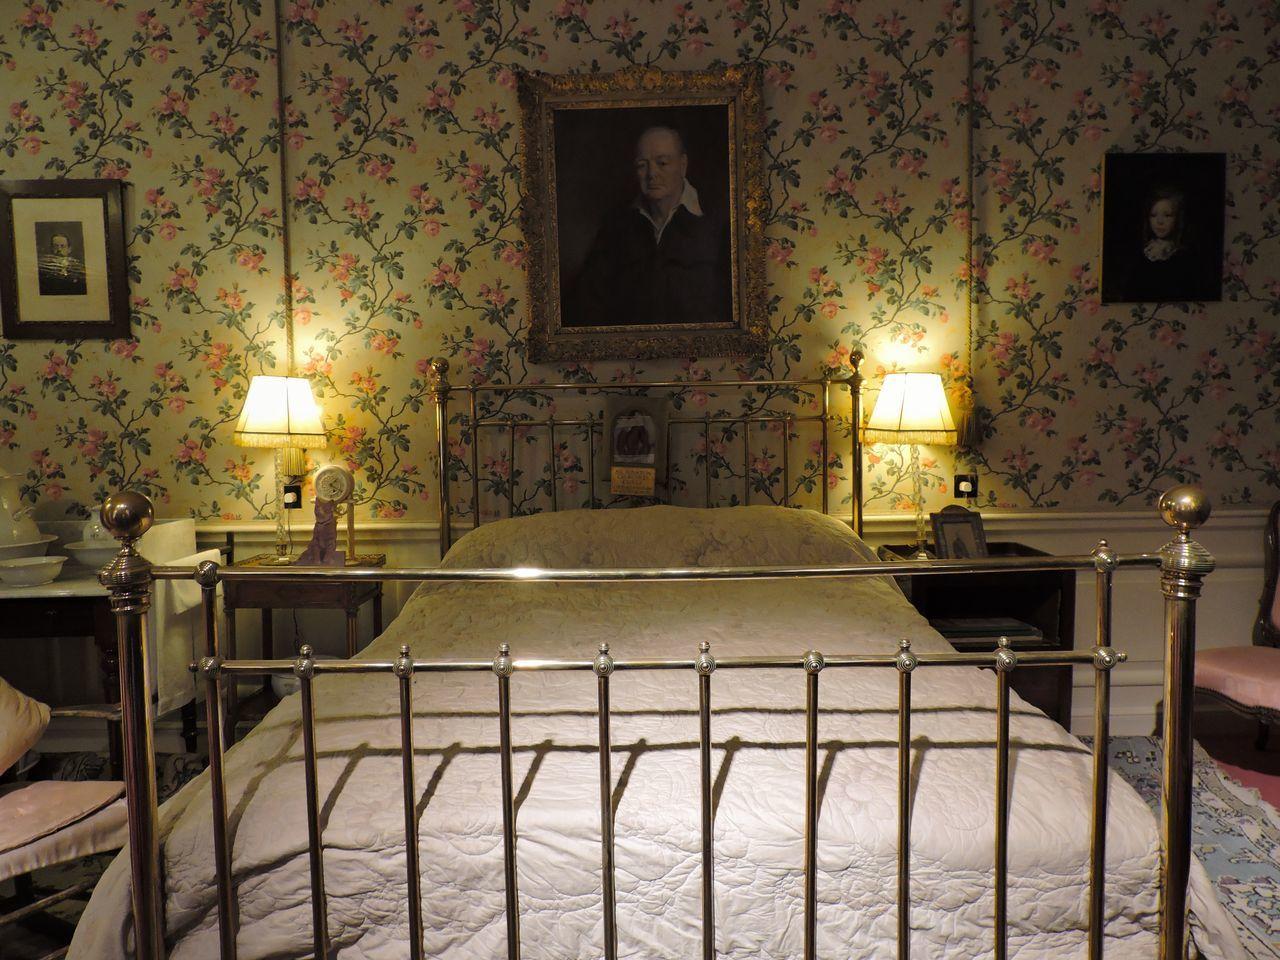 Bedroom Built Structure History Illuminated Indoors  Light And Shadow No People Room Decor Winston Churchill Blenheimpalace Lighting